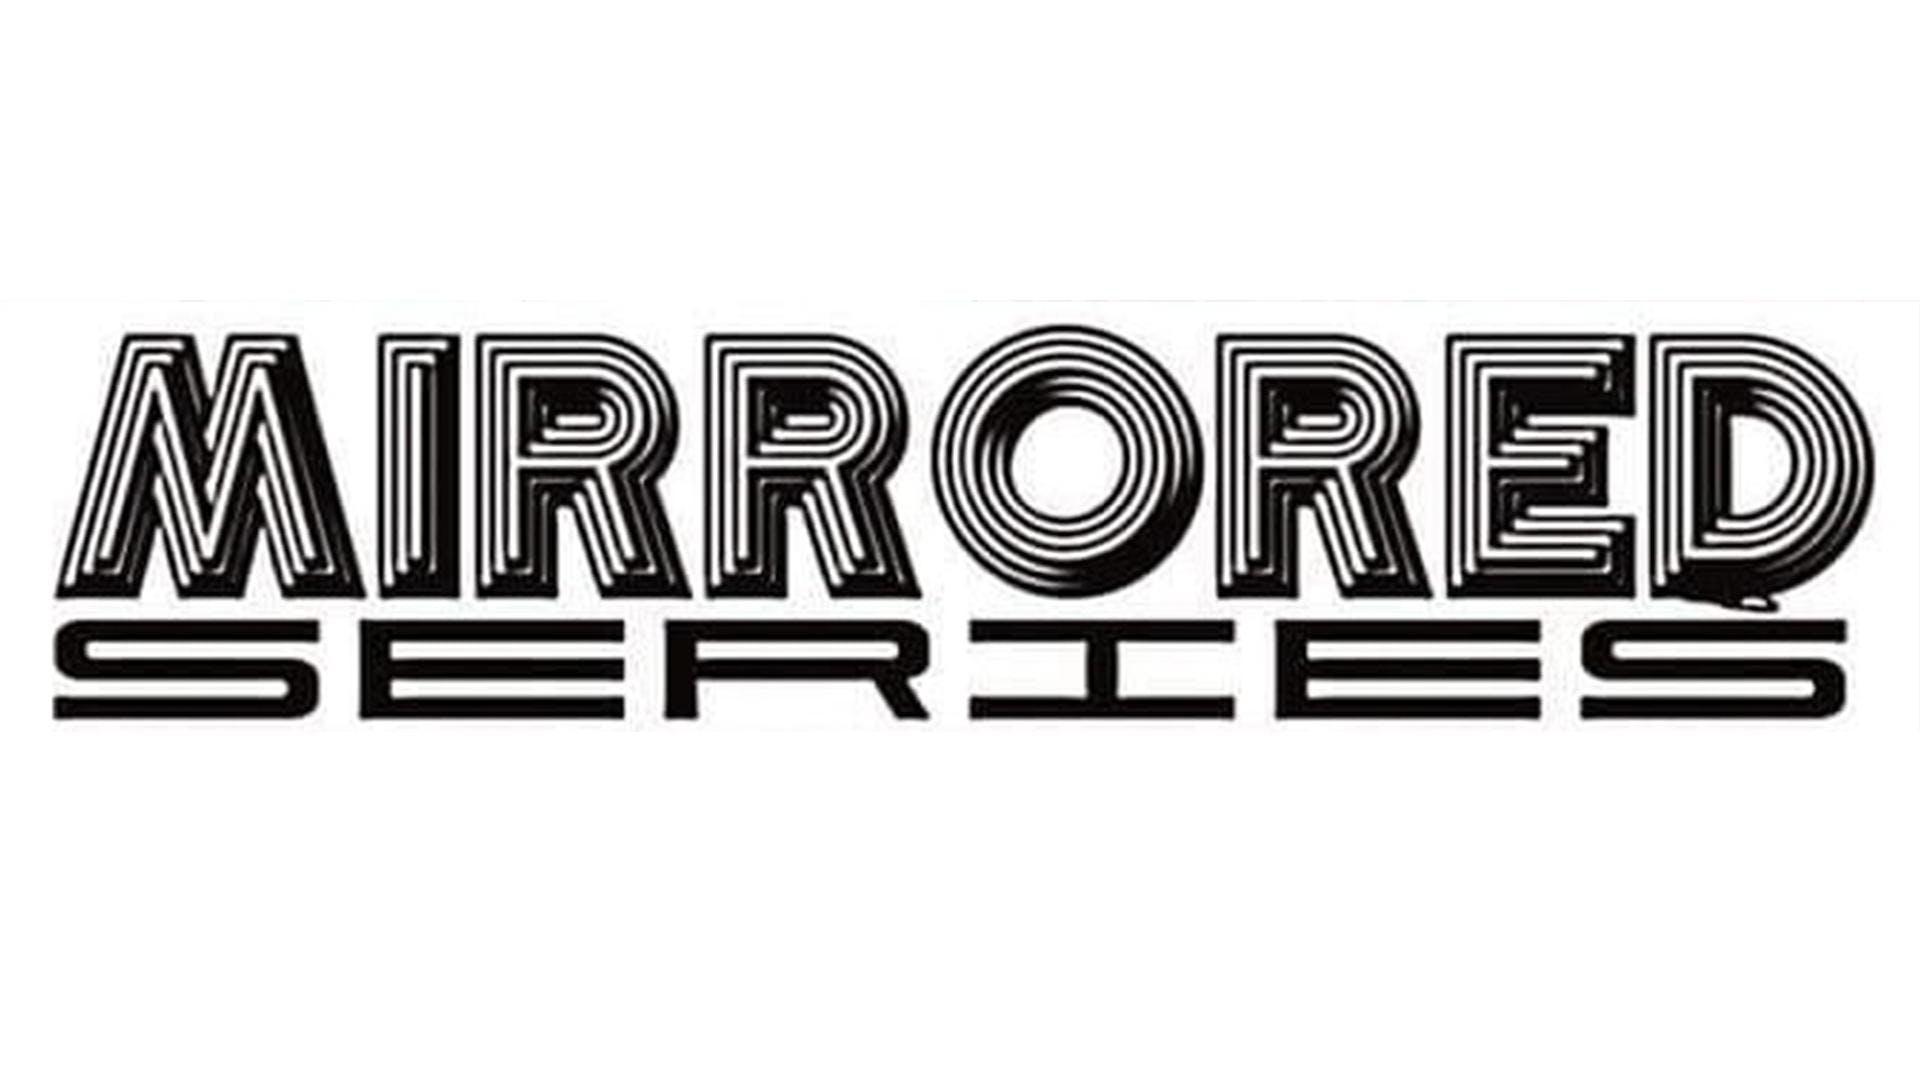 Mirrored Series featuring Mute Duo (Quintet) / Akosuen / Tyler Damon & Eli Winter